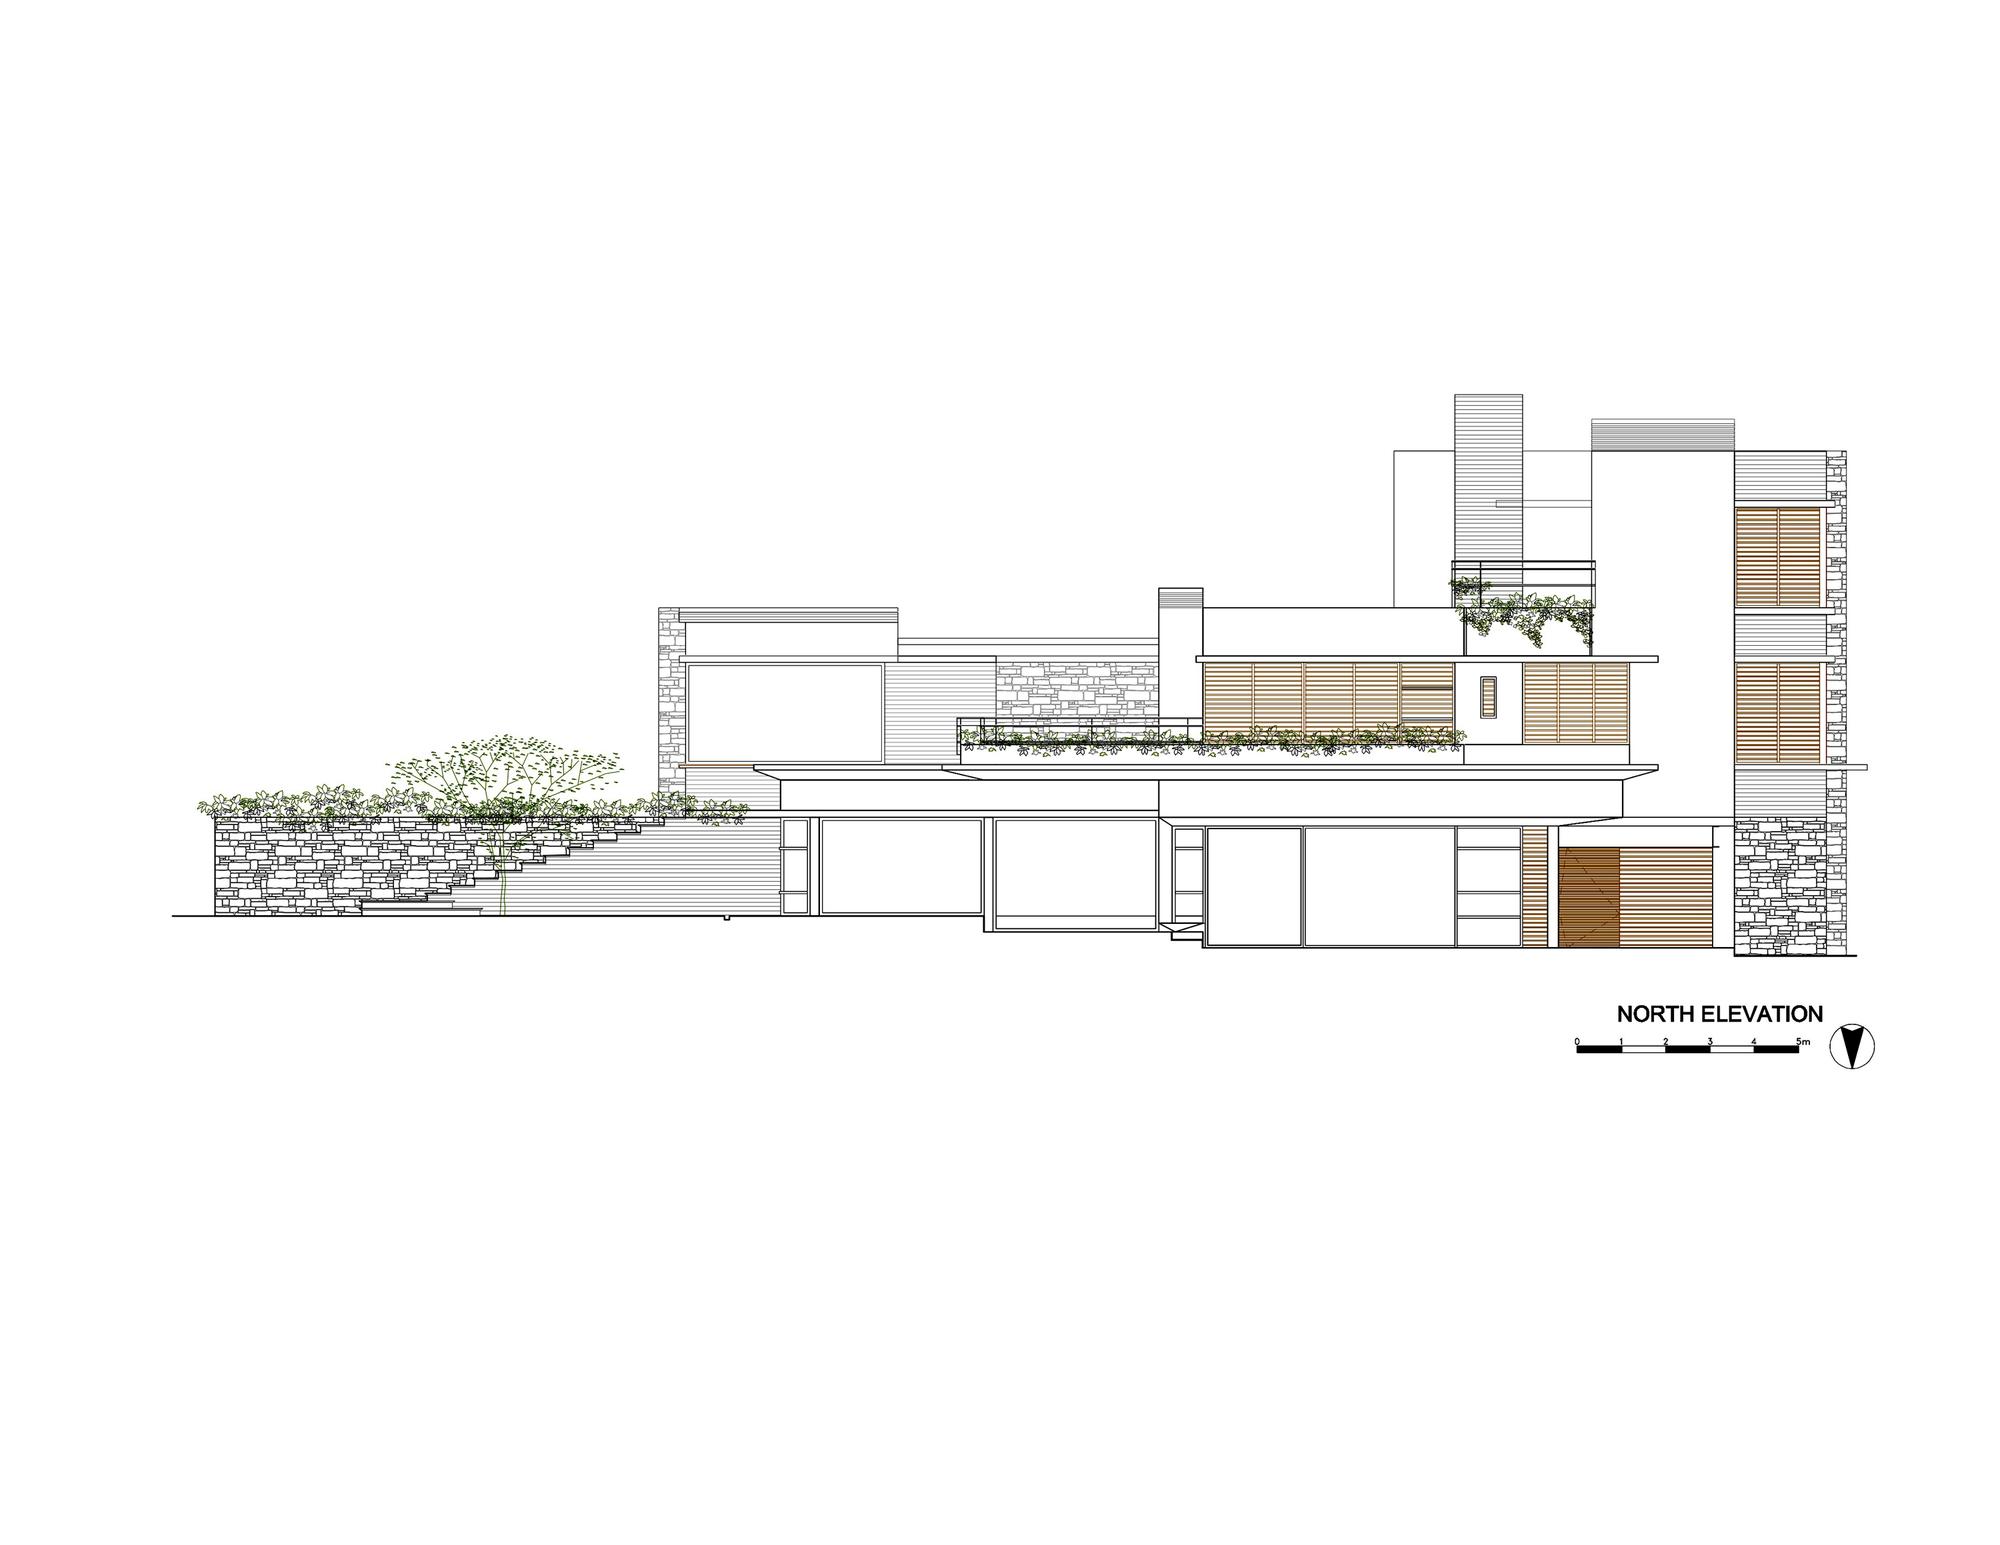 530eba91c07a80ed3b00015b_house-maza-chk-arquitectura_north_elevation